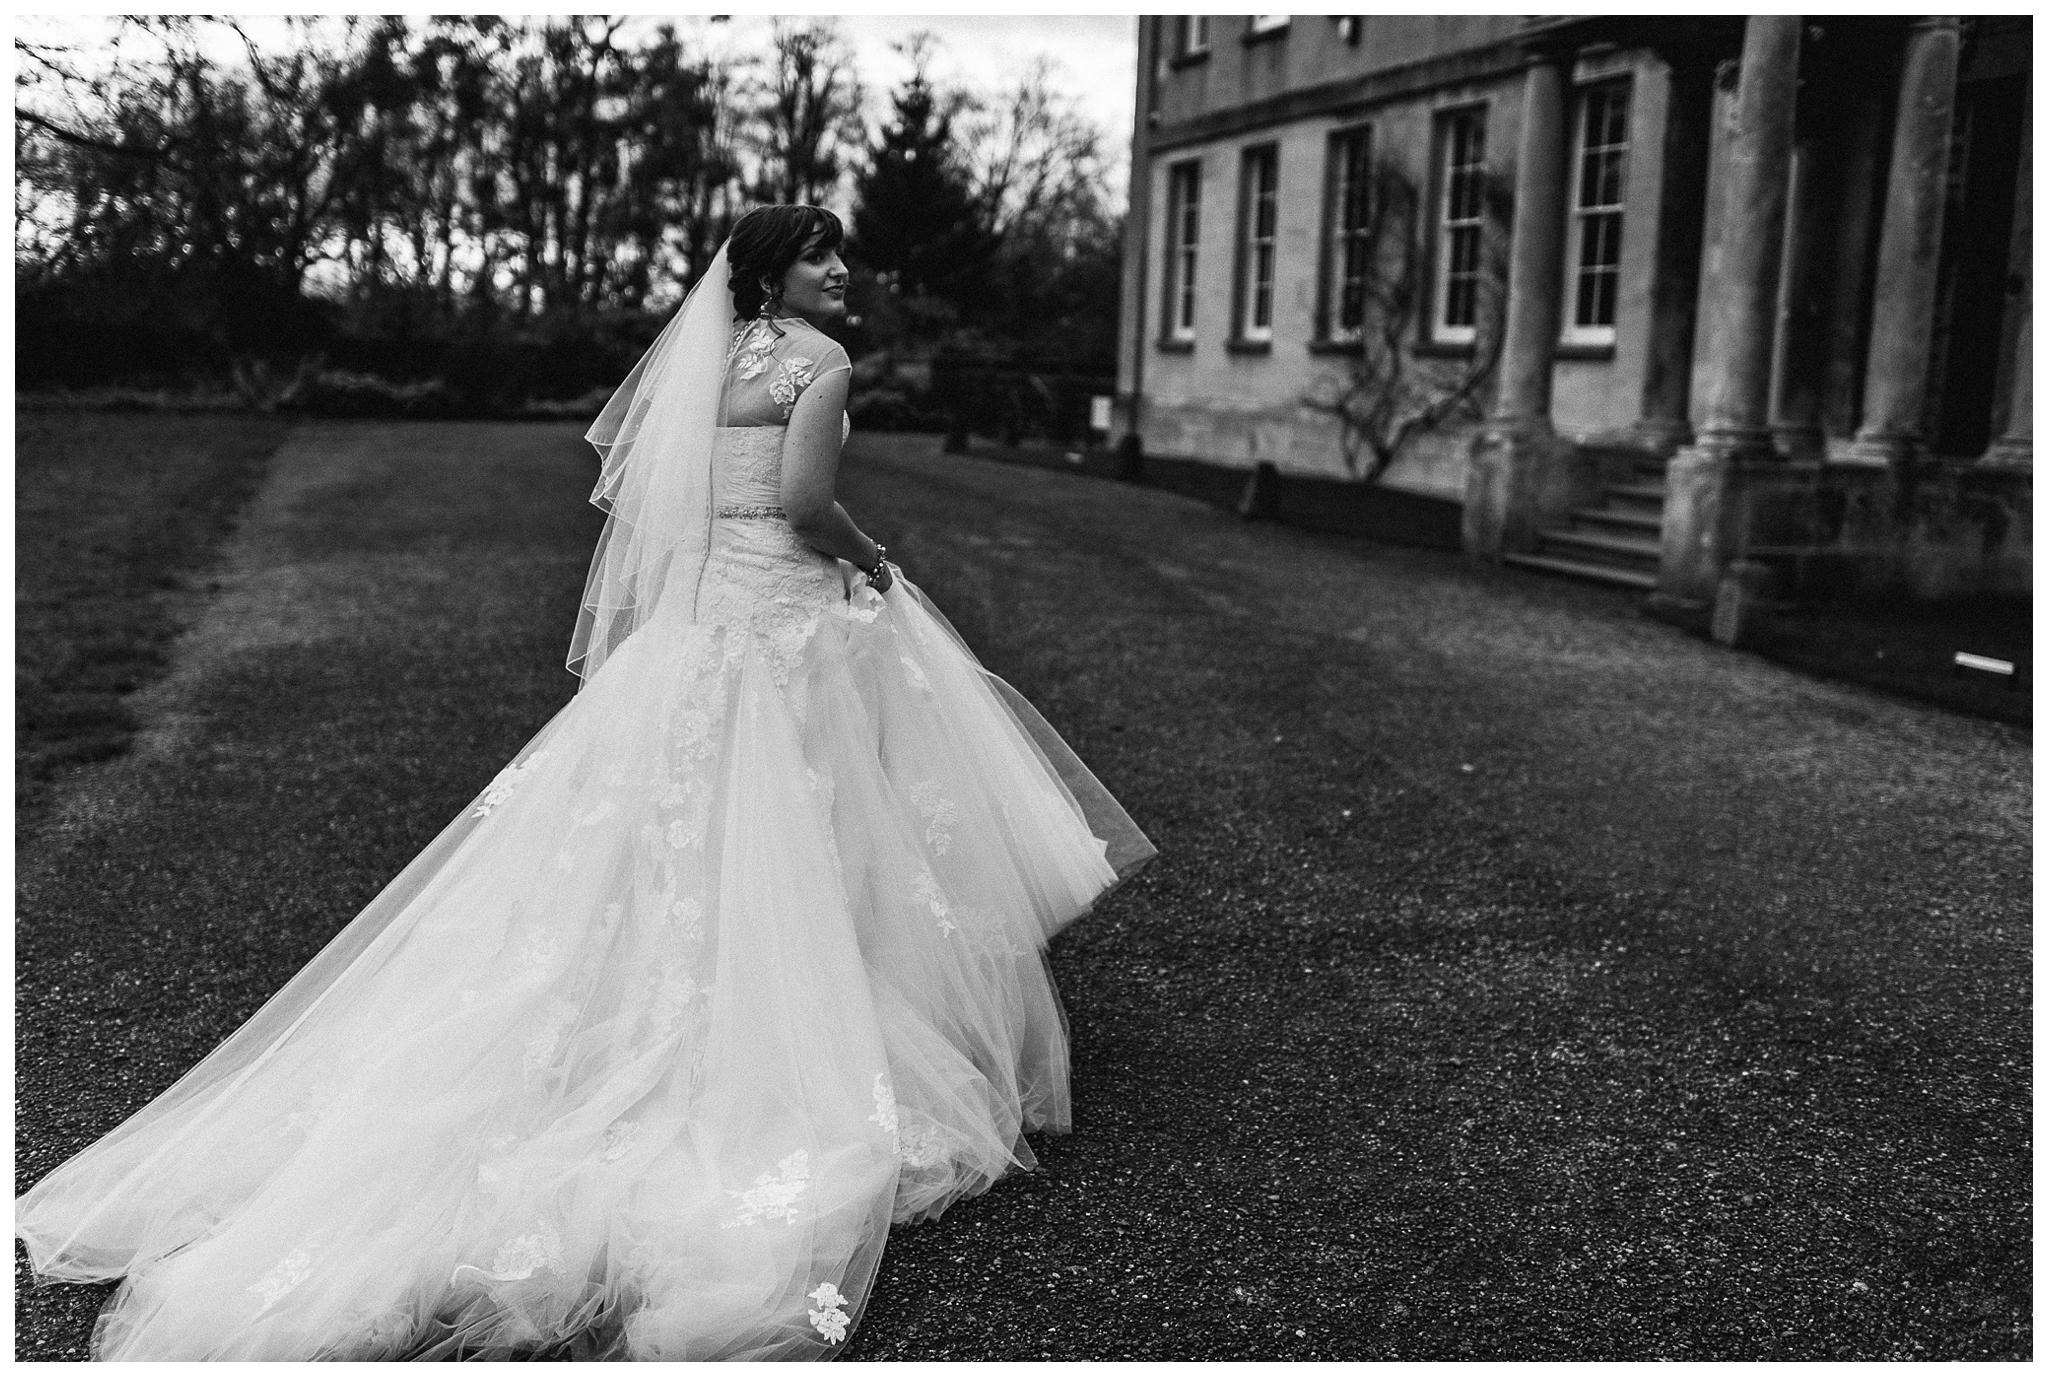 Emma&Paul-Elmore-Court-Winter-Wedding-Nikki-Cooper-Photography_0066.jpg